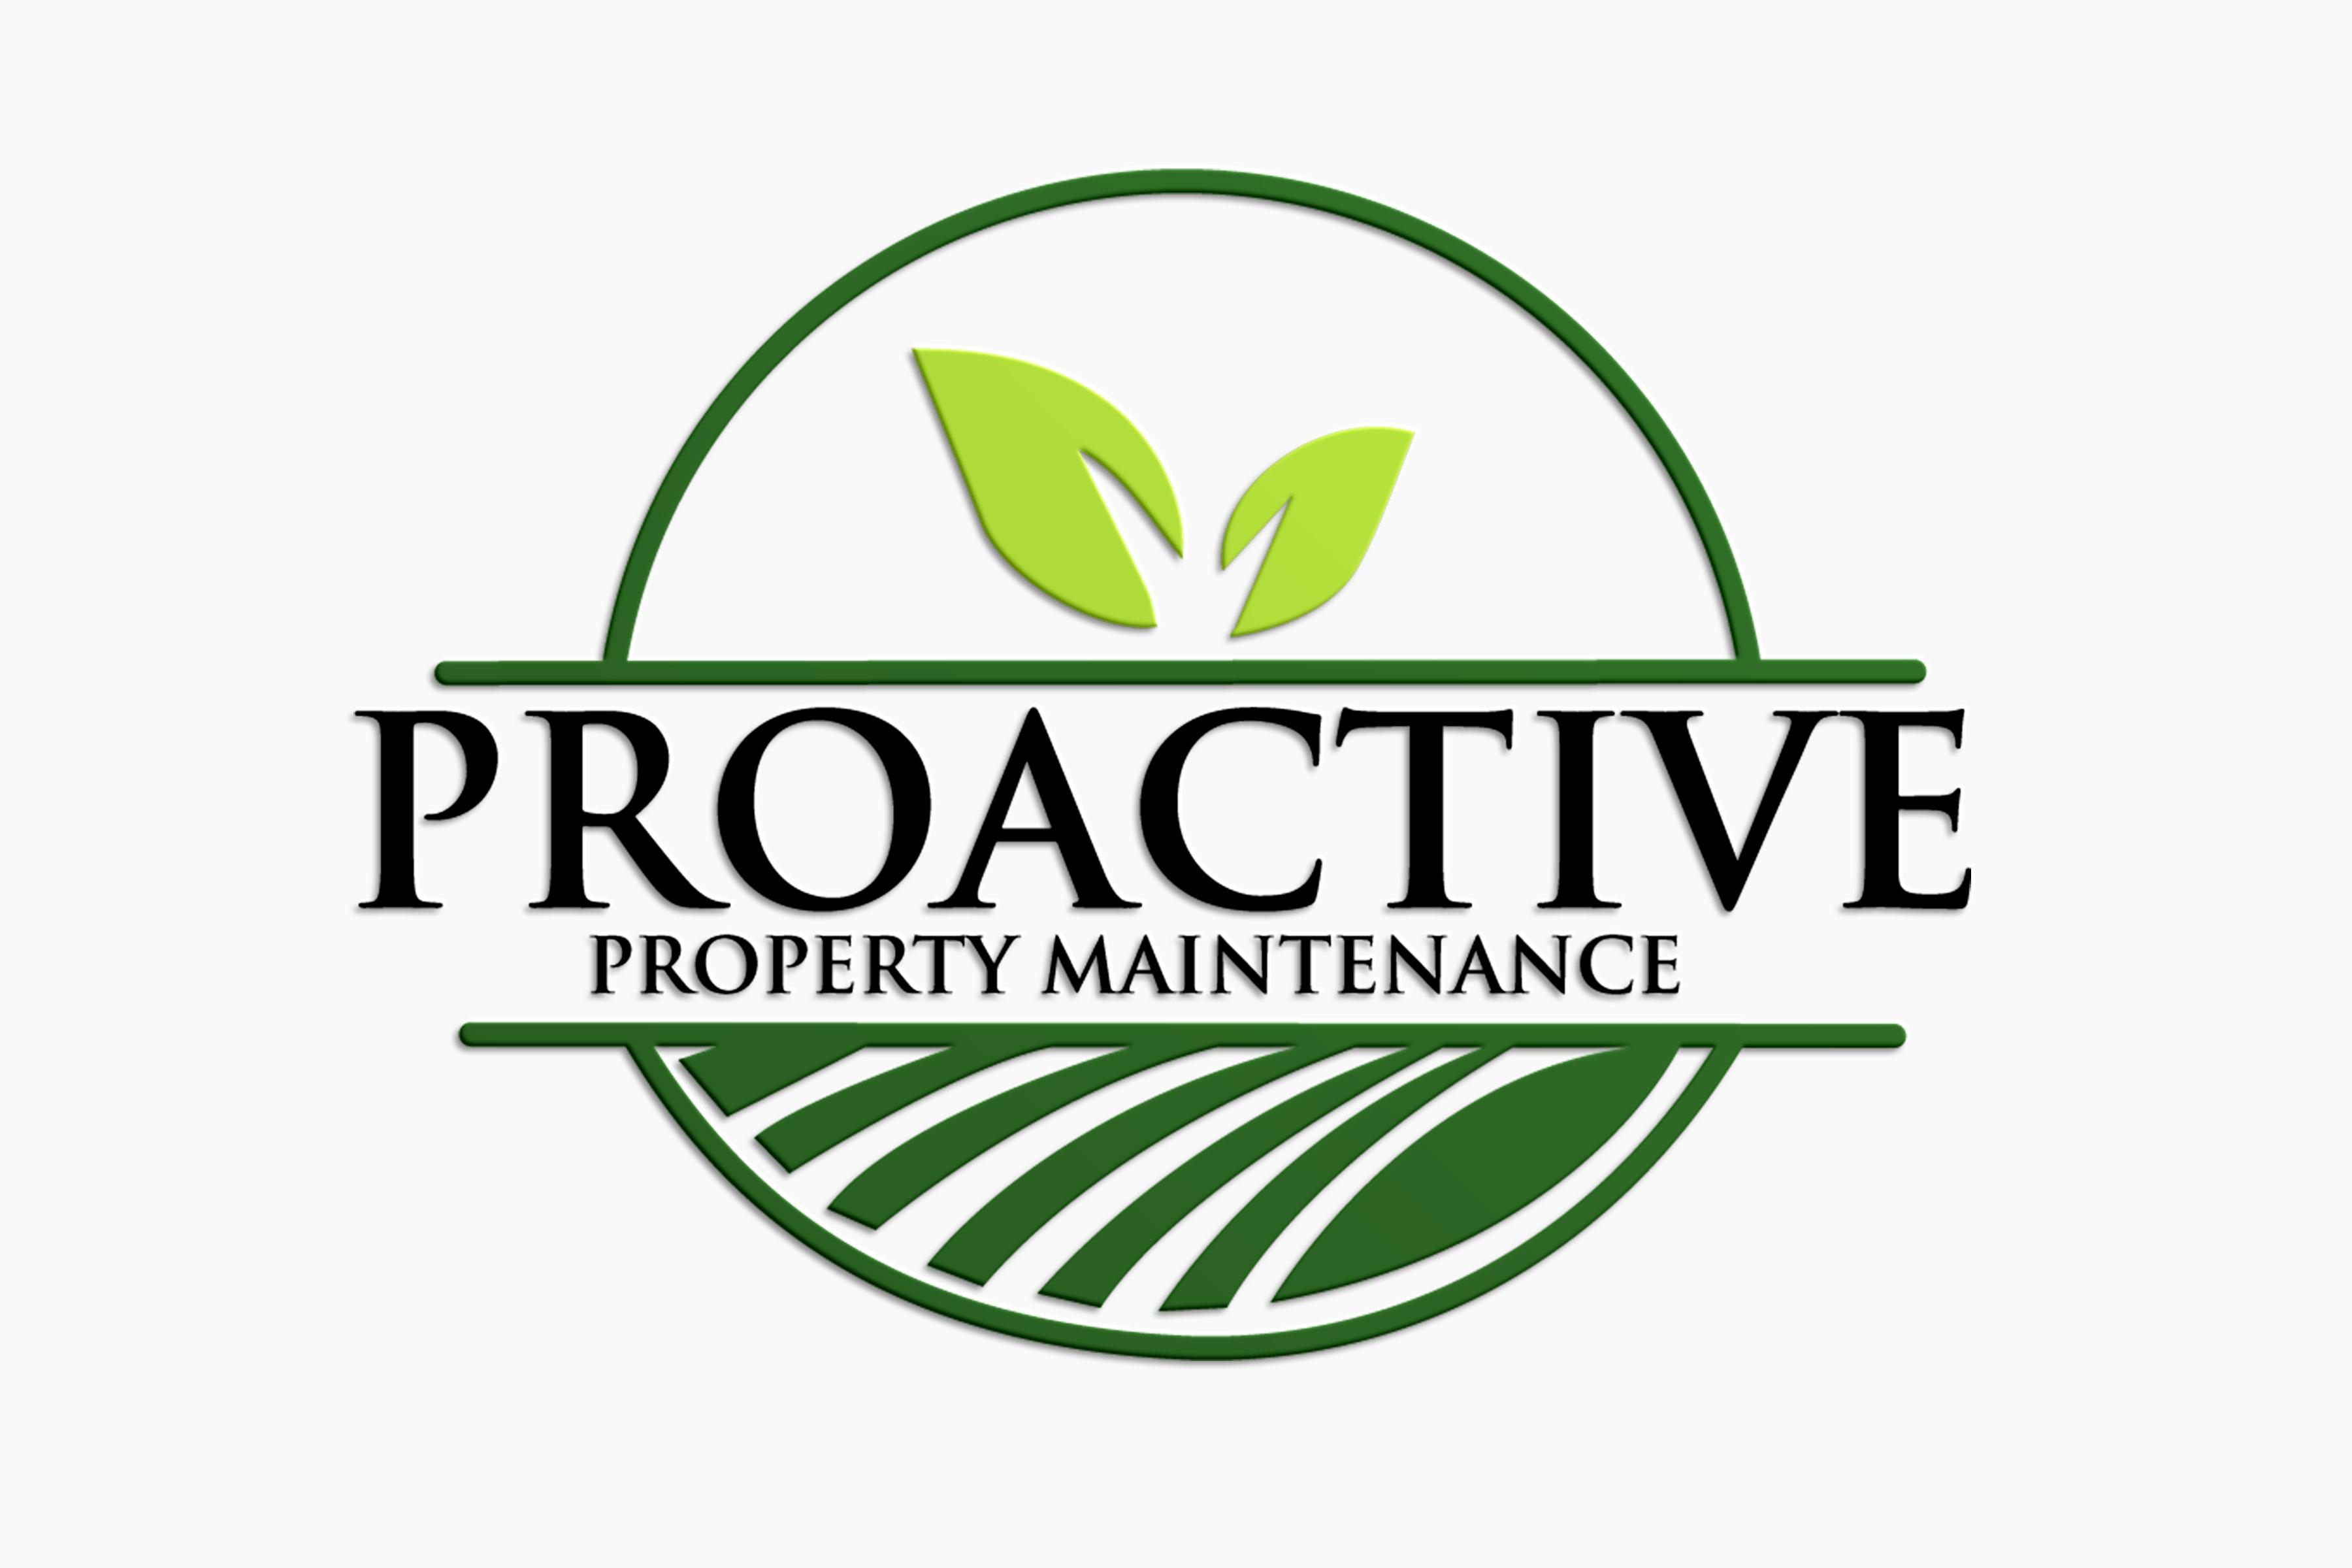 Proactive Property Maintenance